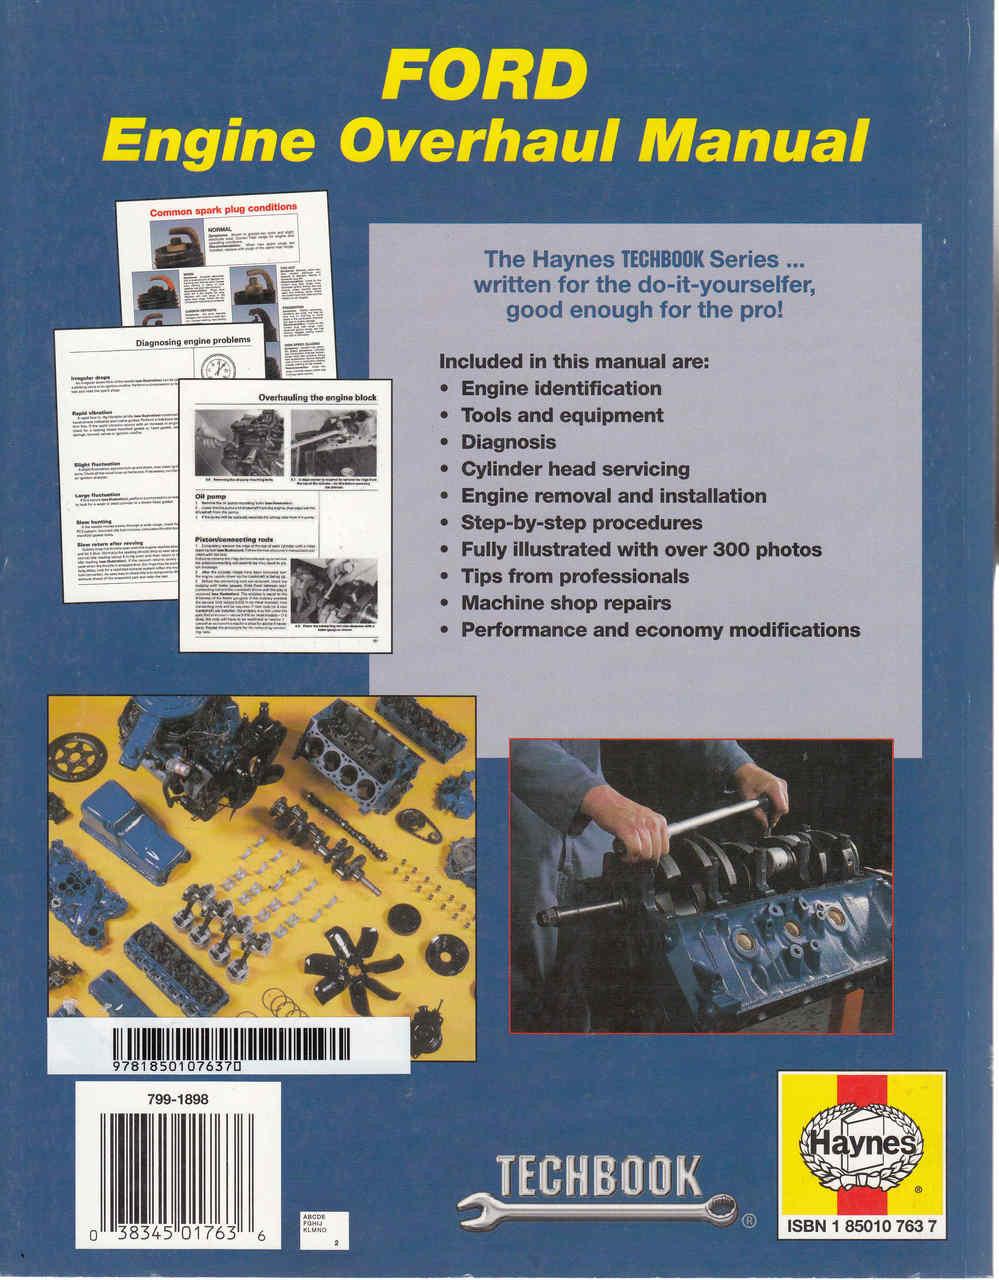 ... Ford Engine Overhaul Manual (Techbook Series) (9781850107637) ...